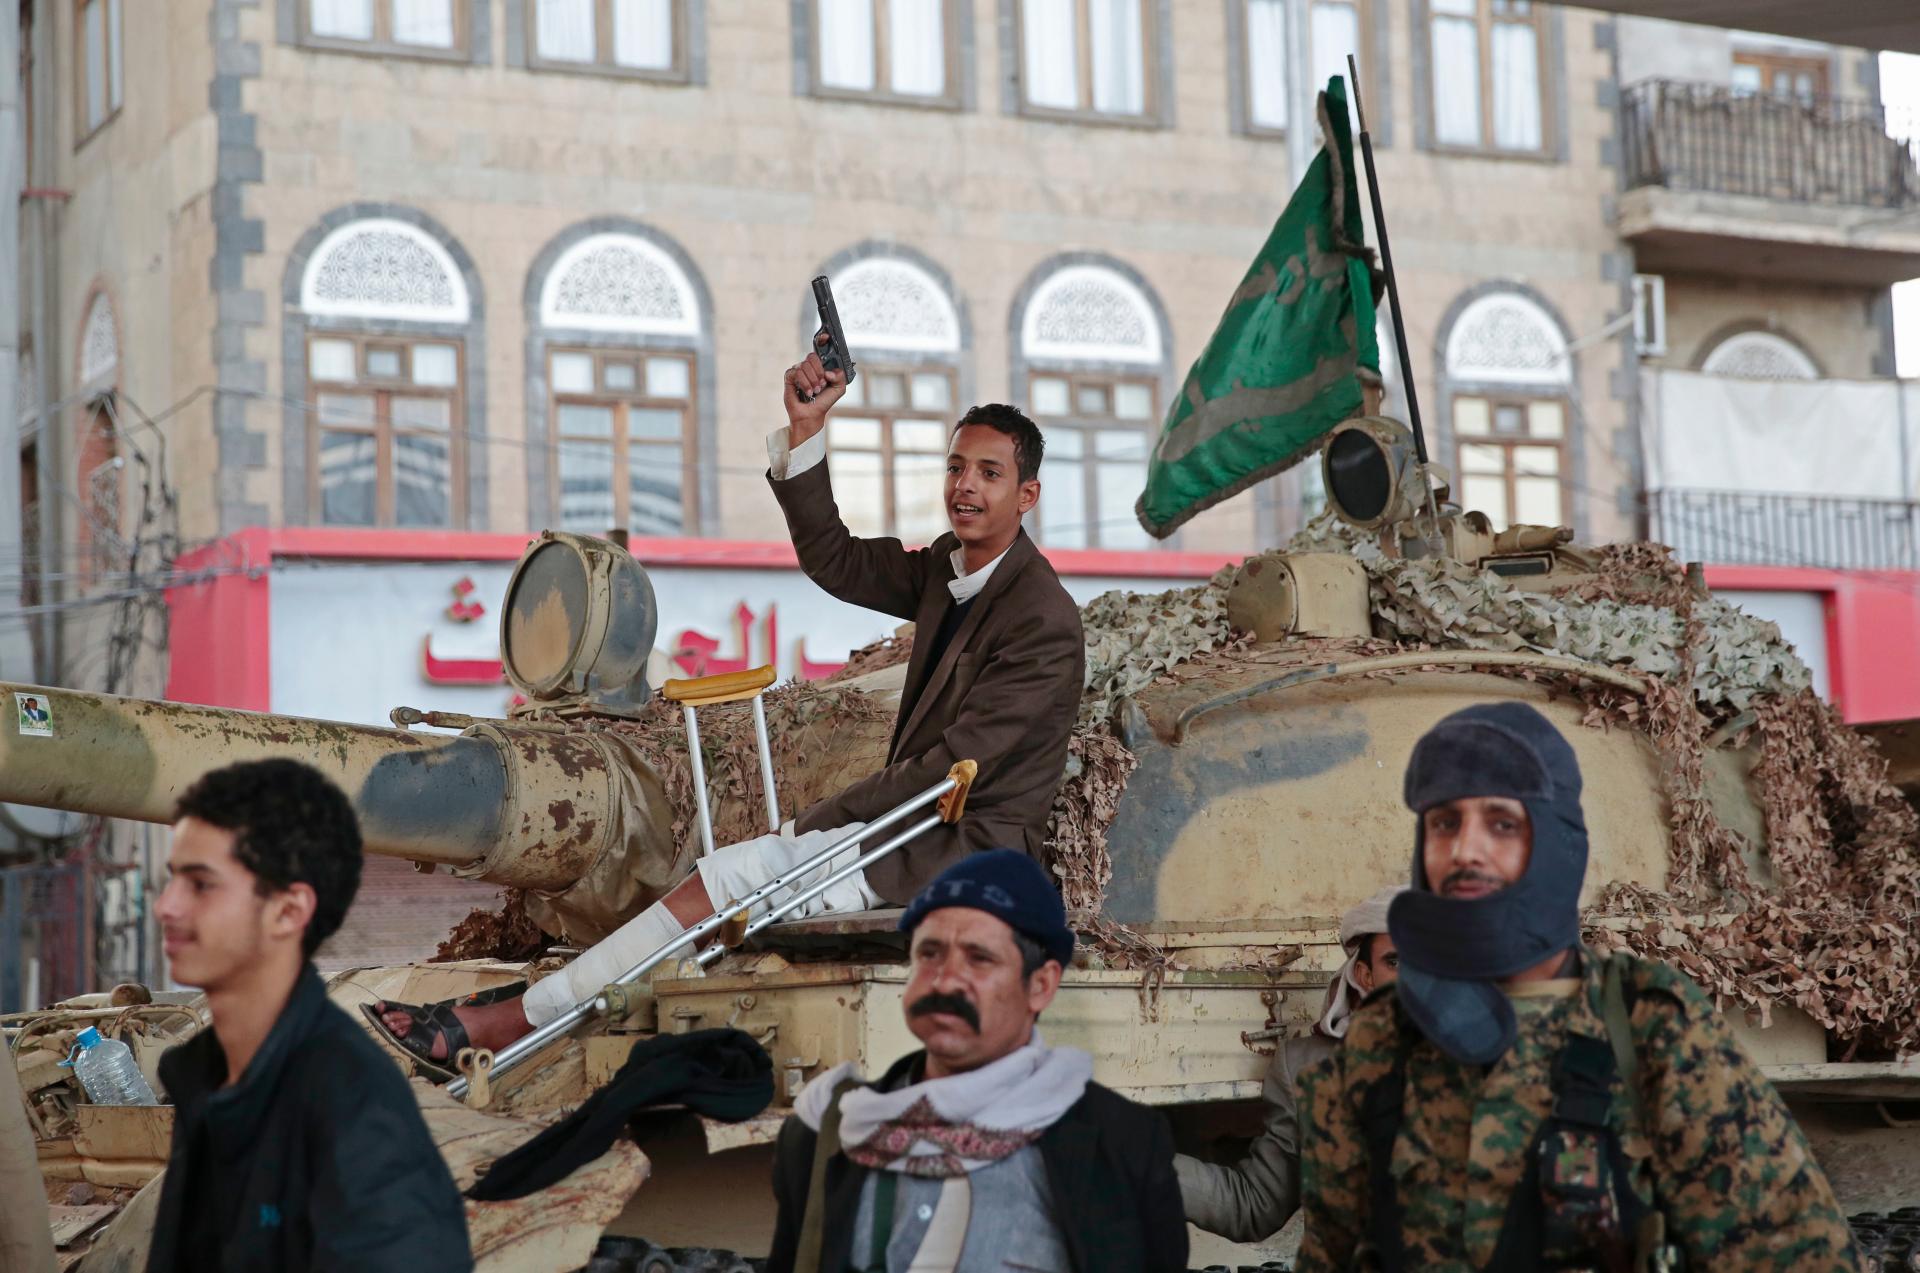 Yemen's Houthi rebels announce halt in attacks on Saudi Arabia